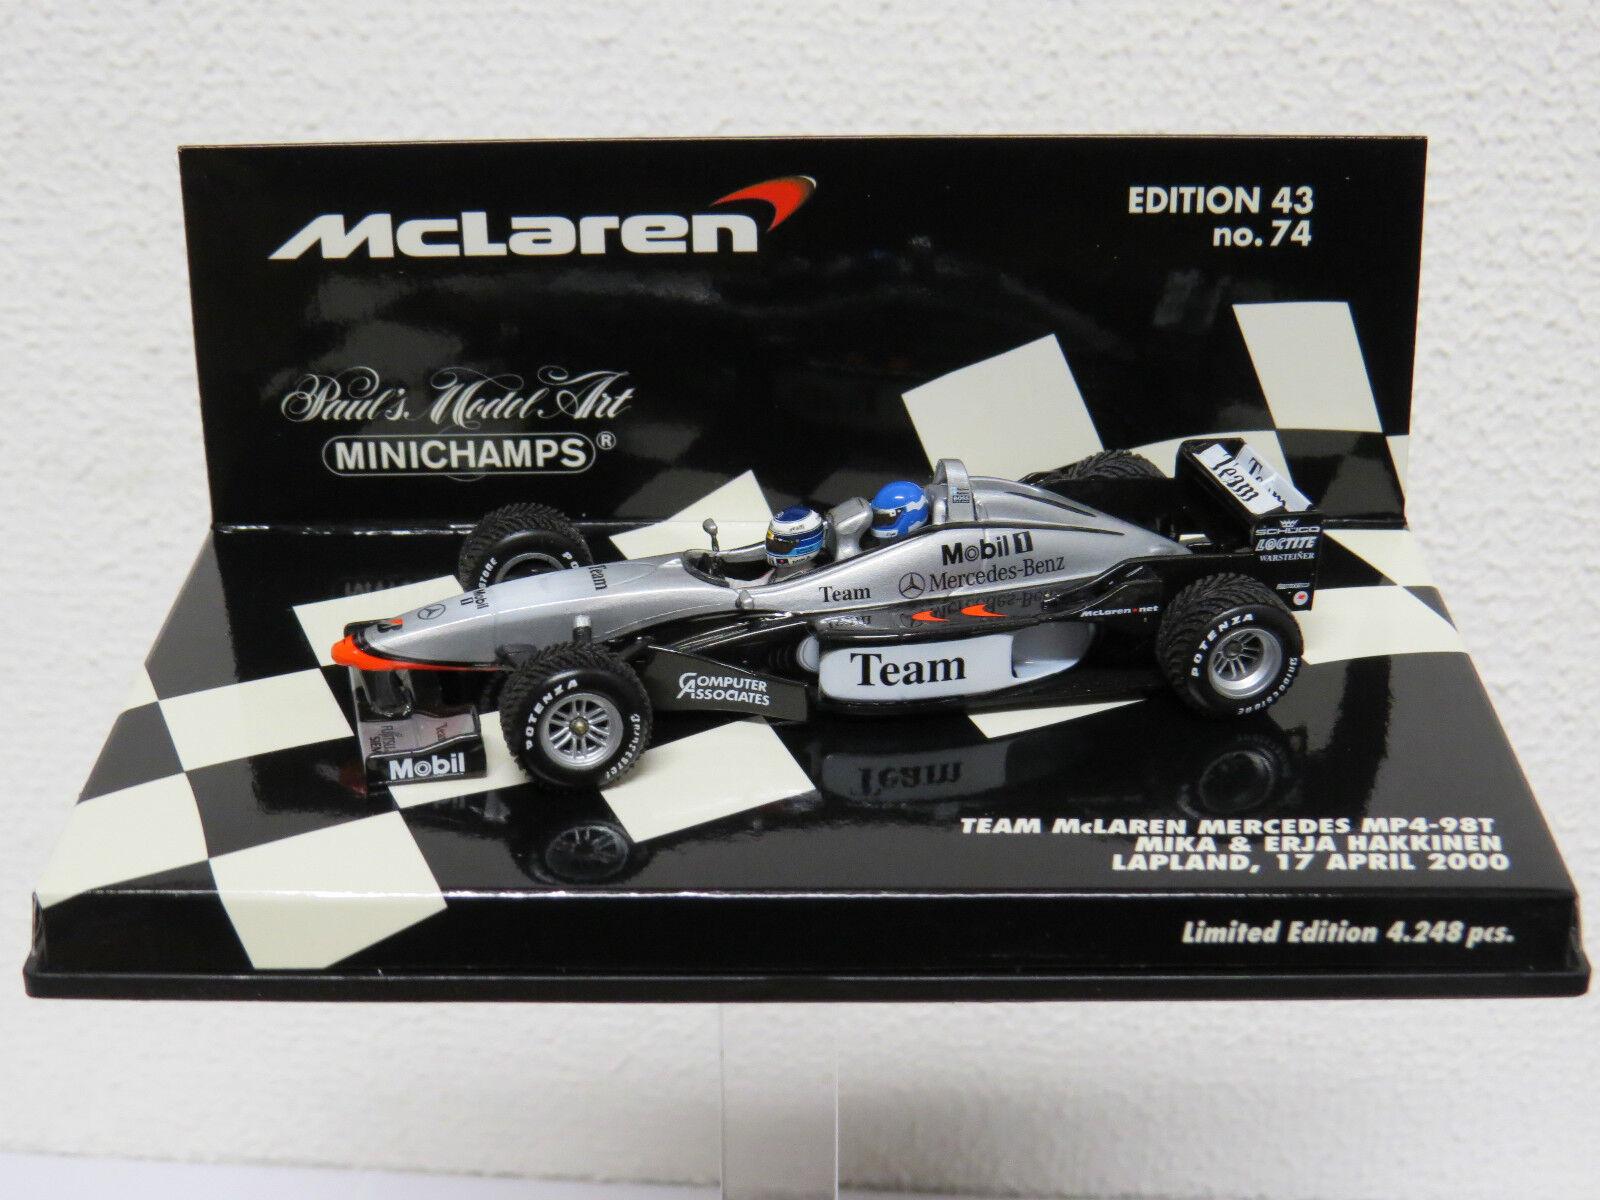 McLaren MP4 98T Mika & Erja Hakkinen Lapland, 17 April April April 2000 Nr. 530984378 1dee41